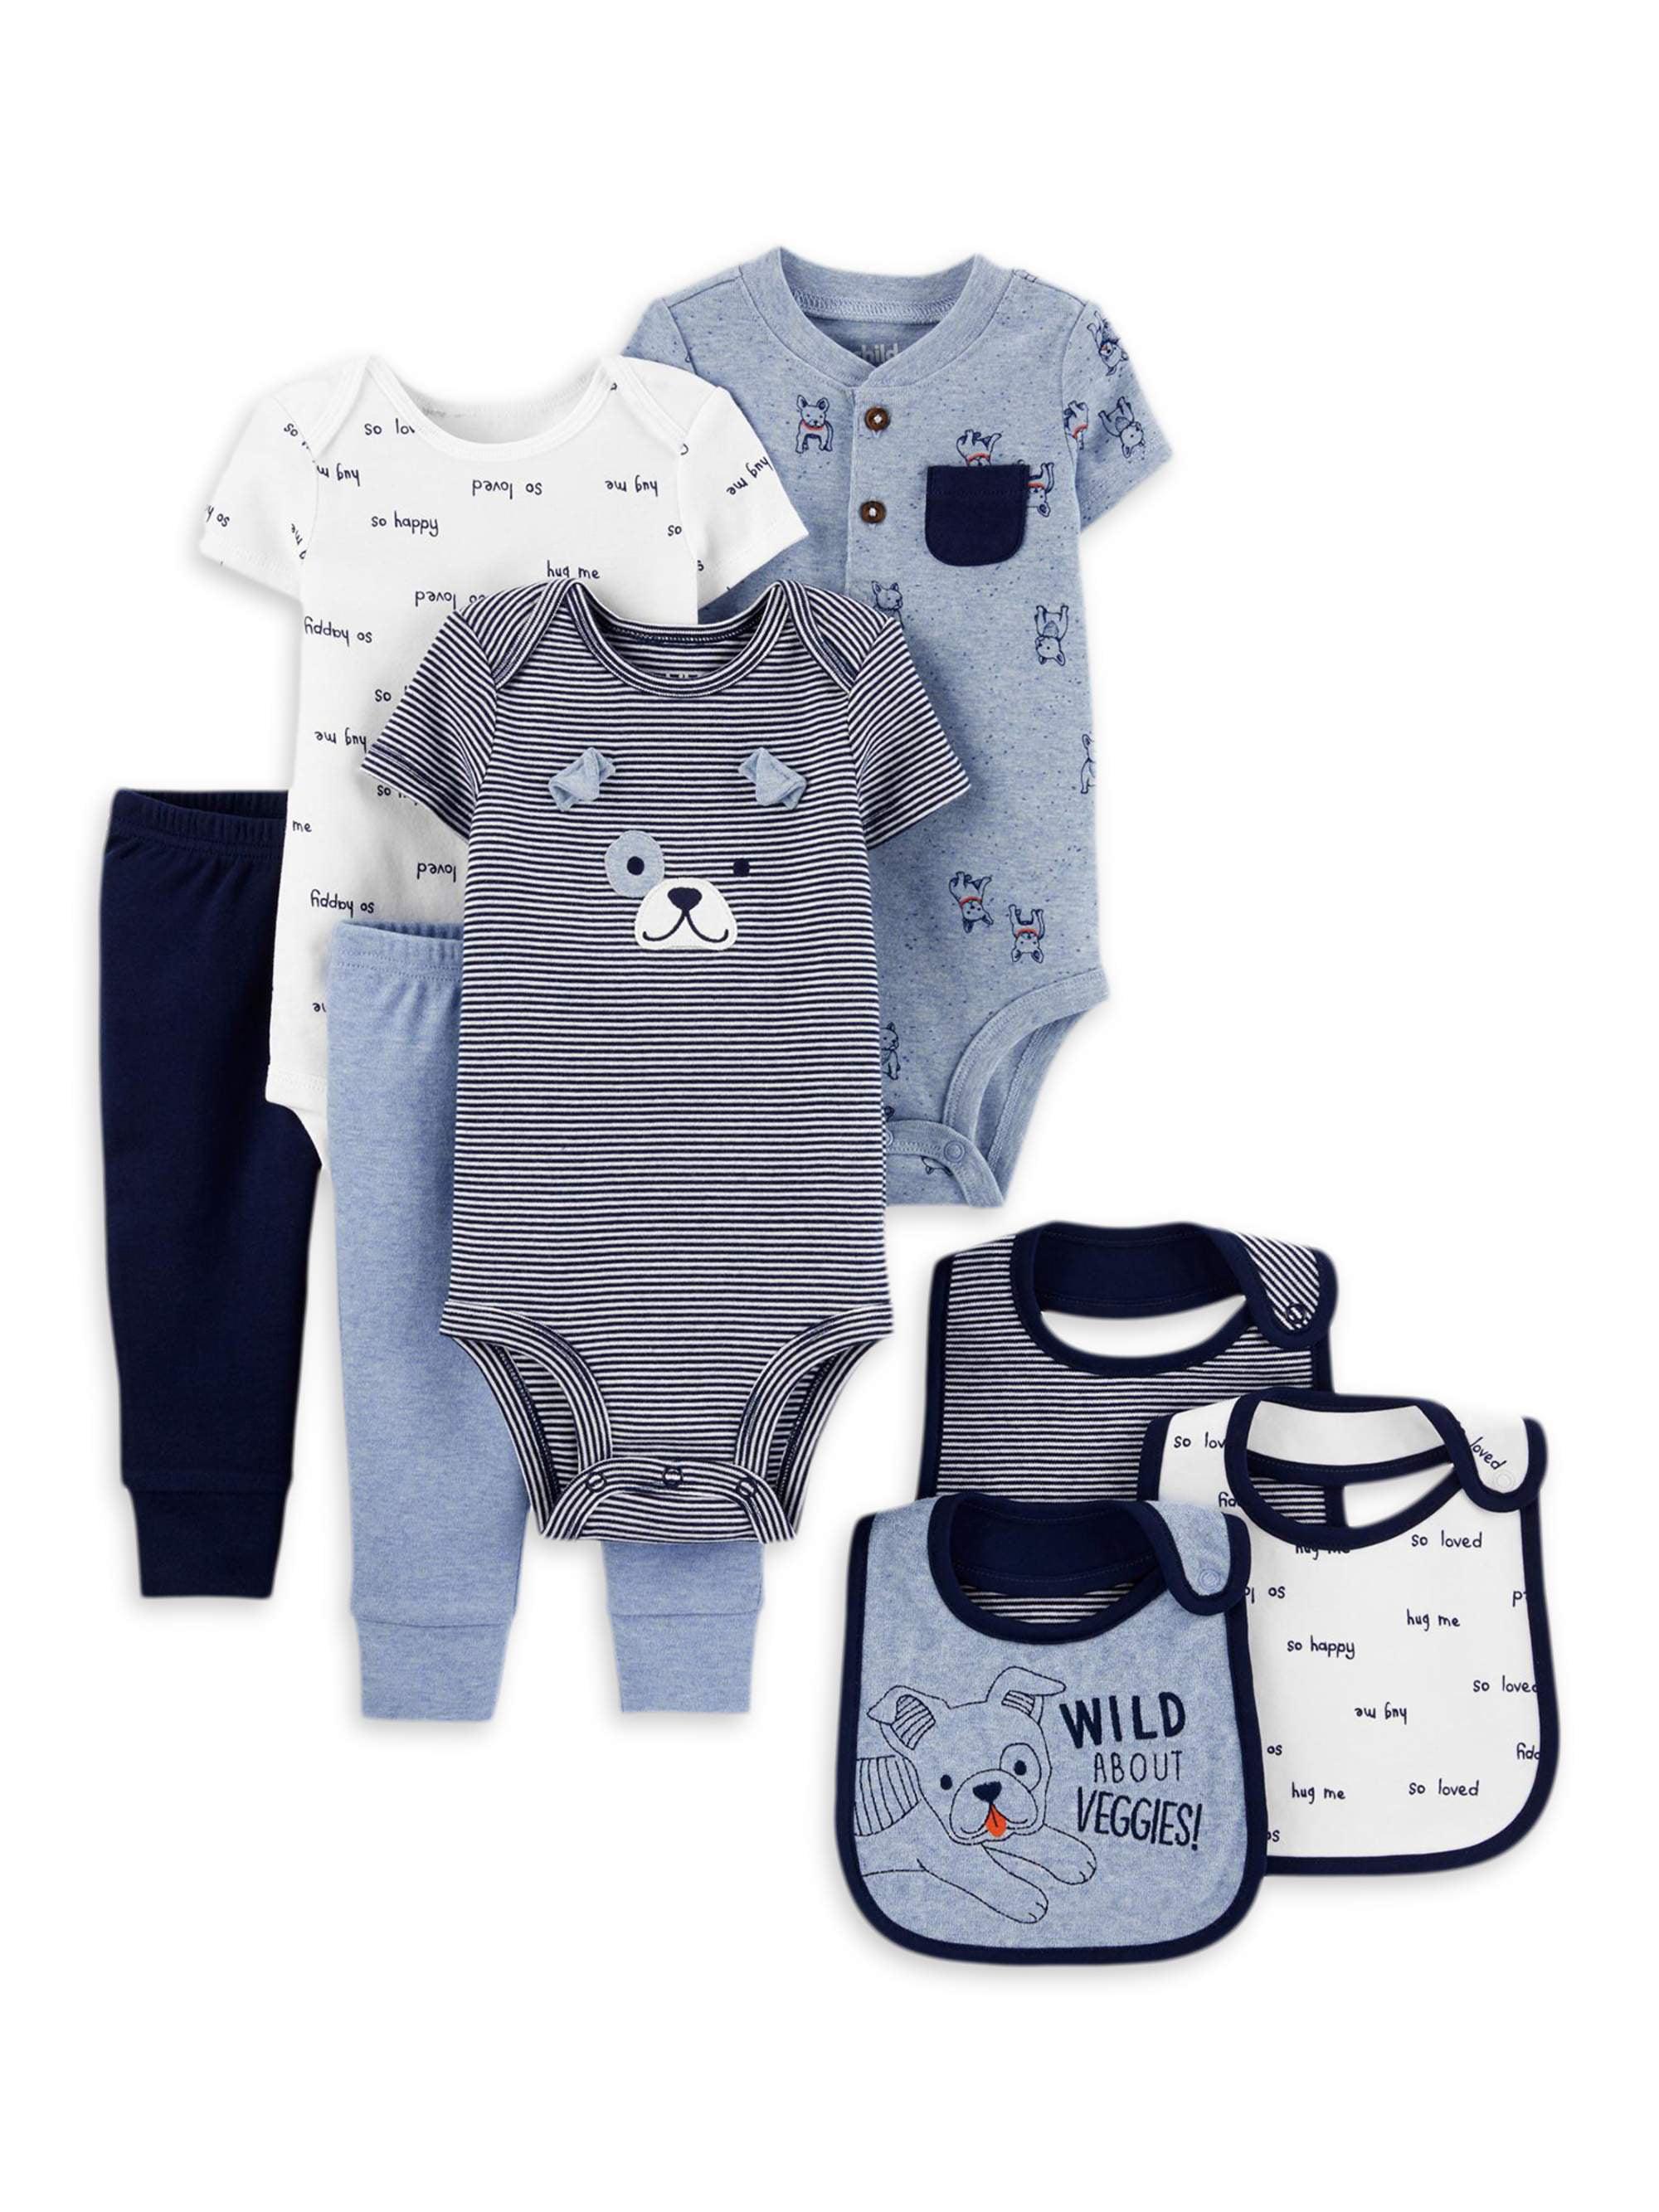 Z Baby Interlock Set Bears Ecru Baby Mixed Clothing Set